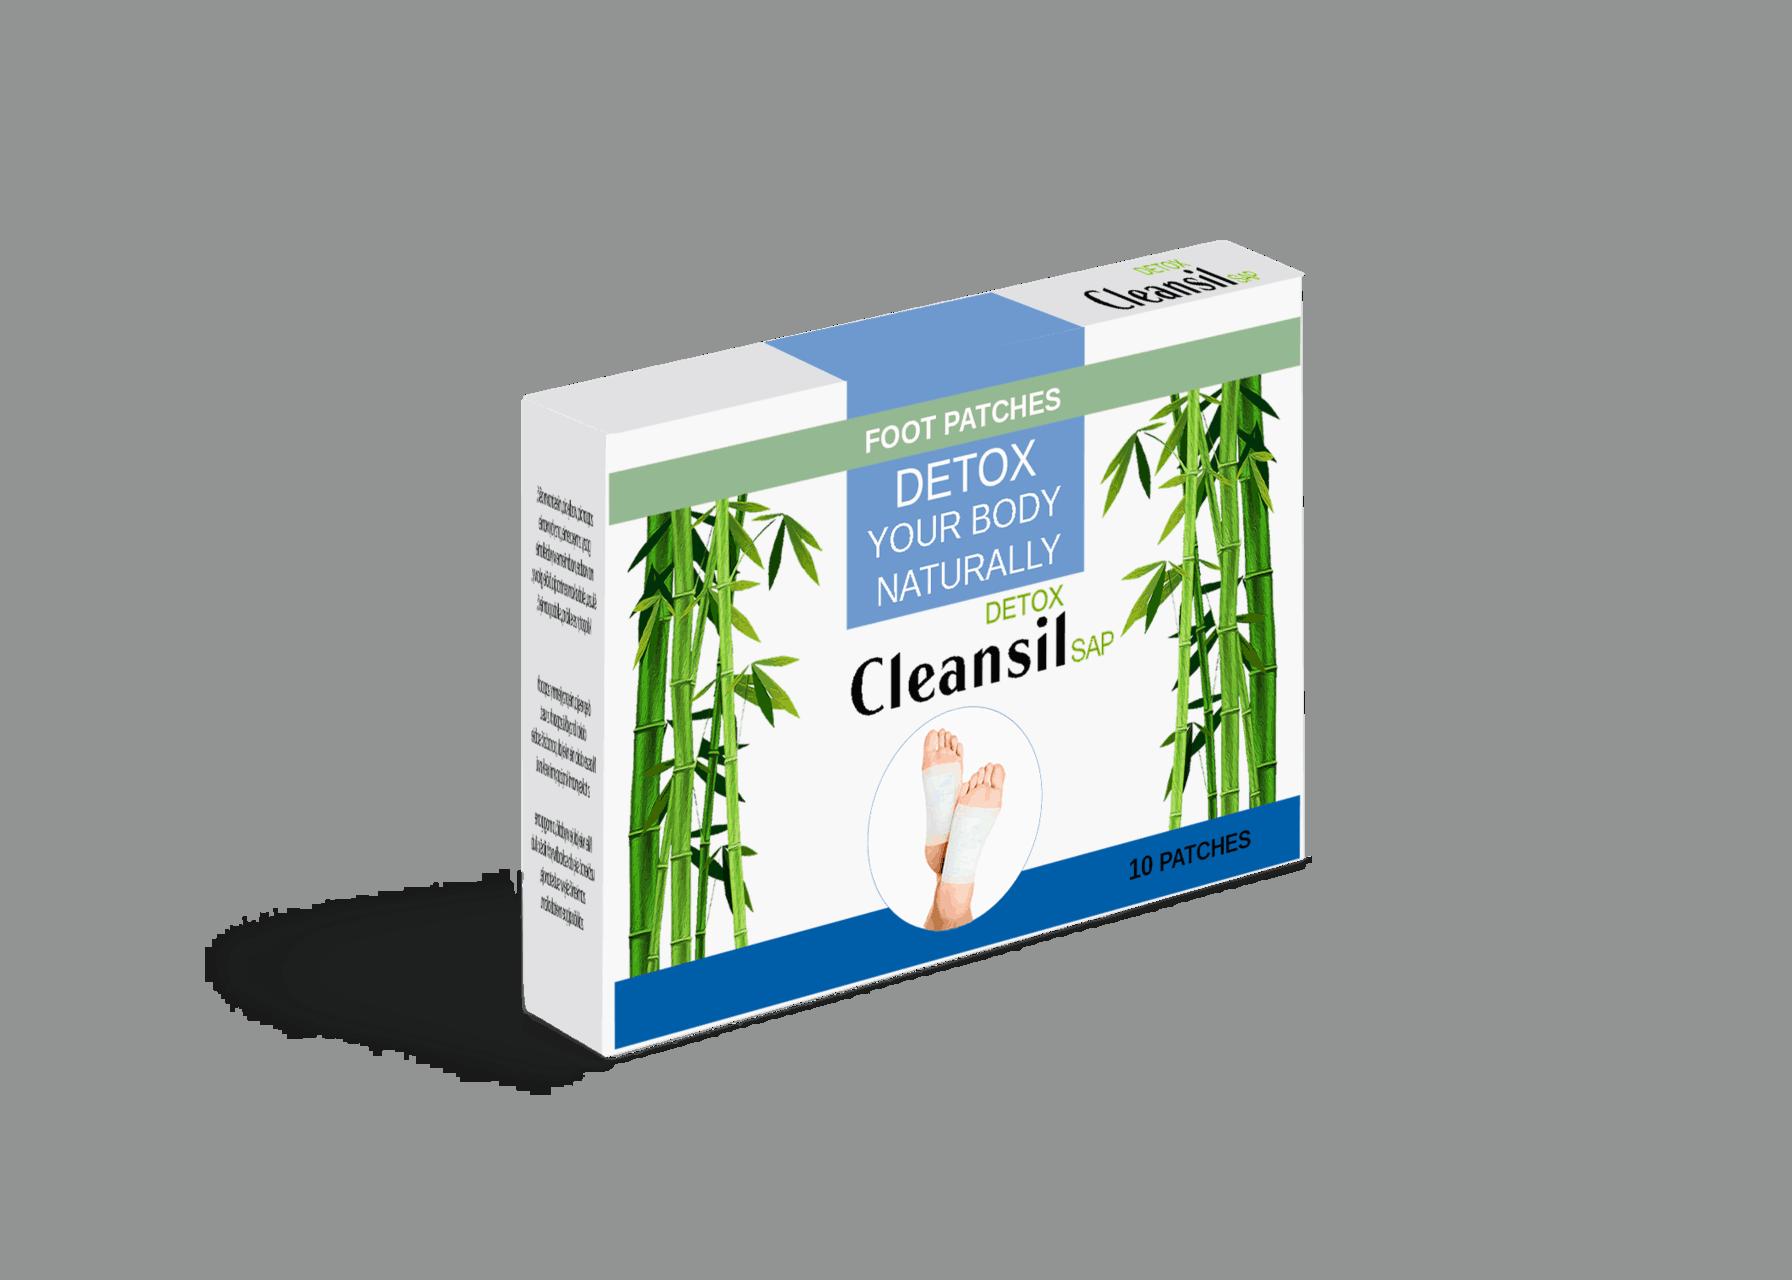 detox your body naturally detox cleansil sap